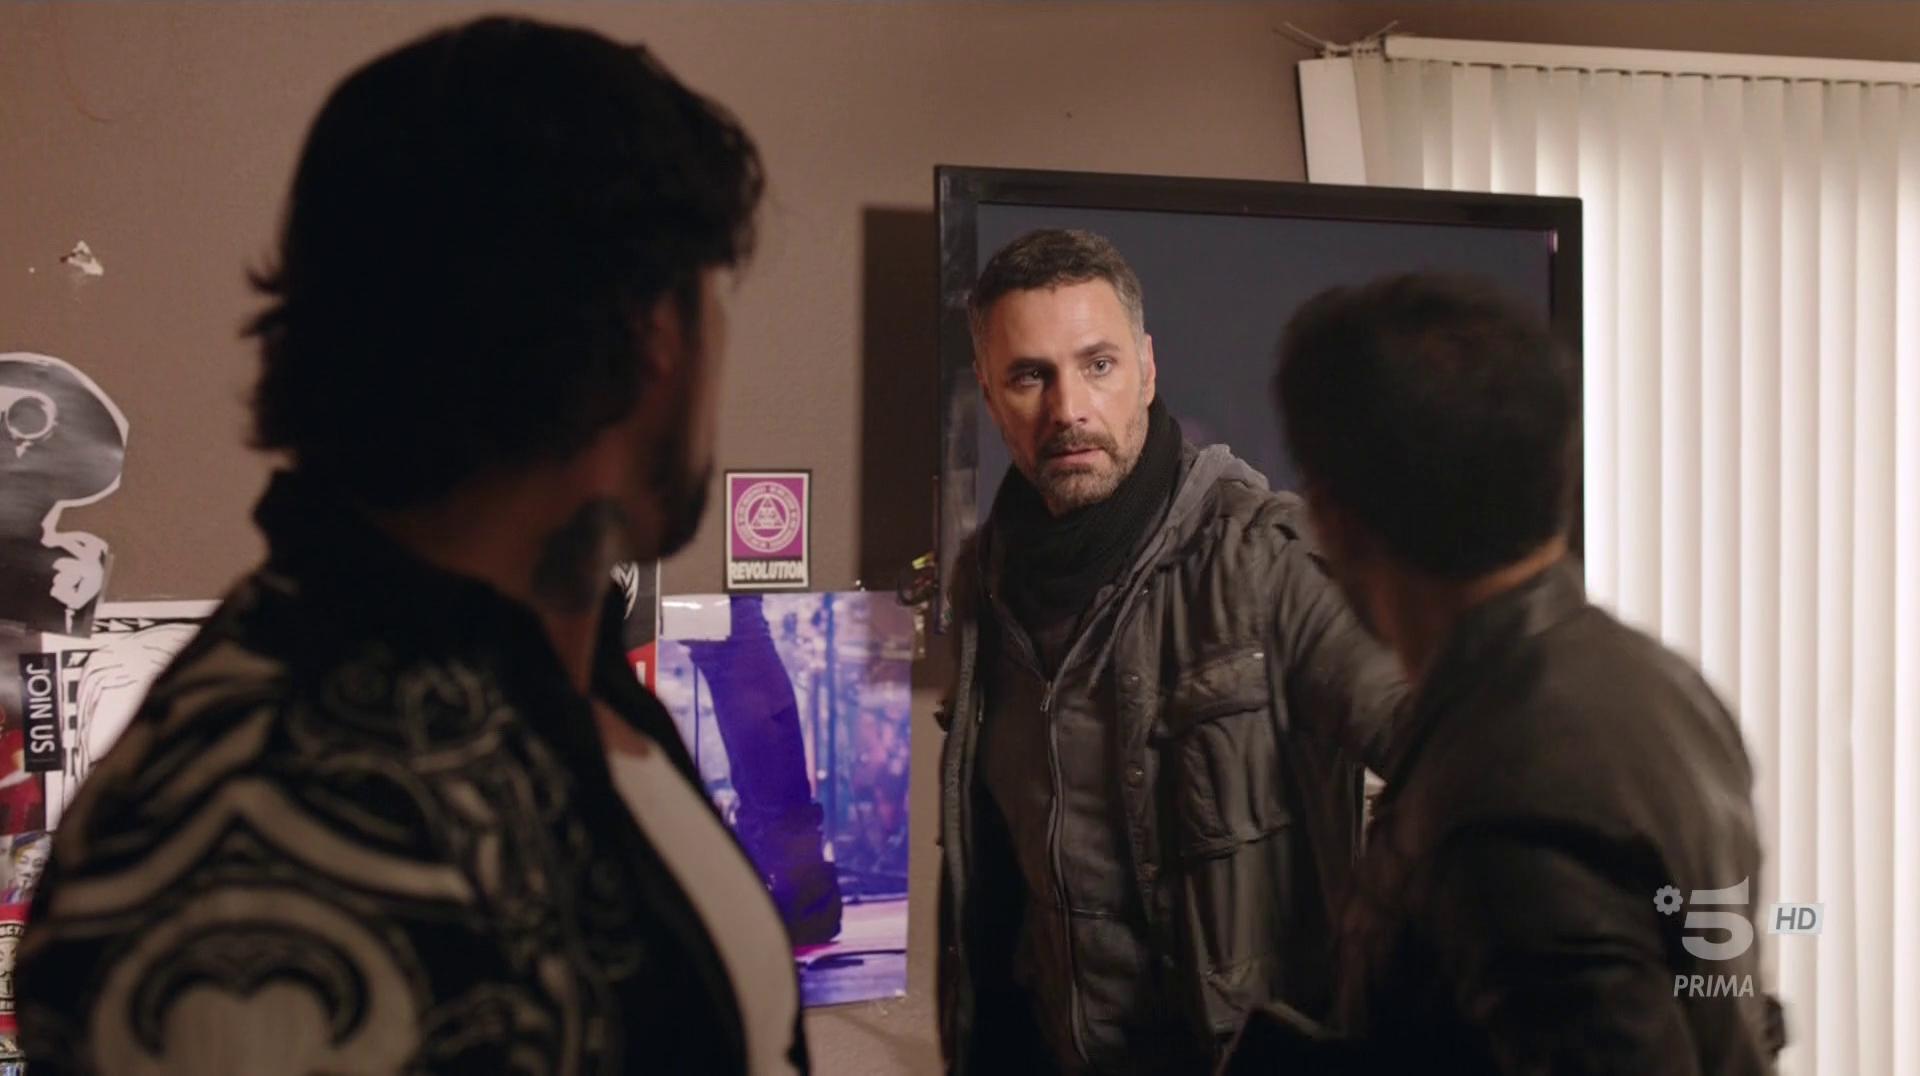 Ultimo - Caccia ai Narcos - MiniSerie (2018) (Completa) HDTV 1080P ITA AC3 x264 mkv